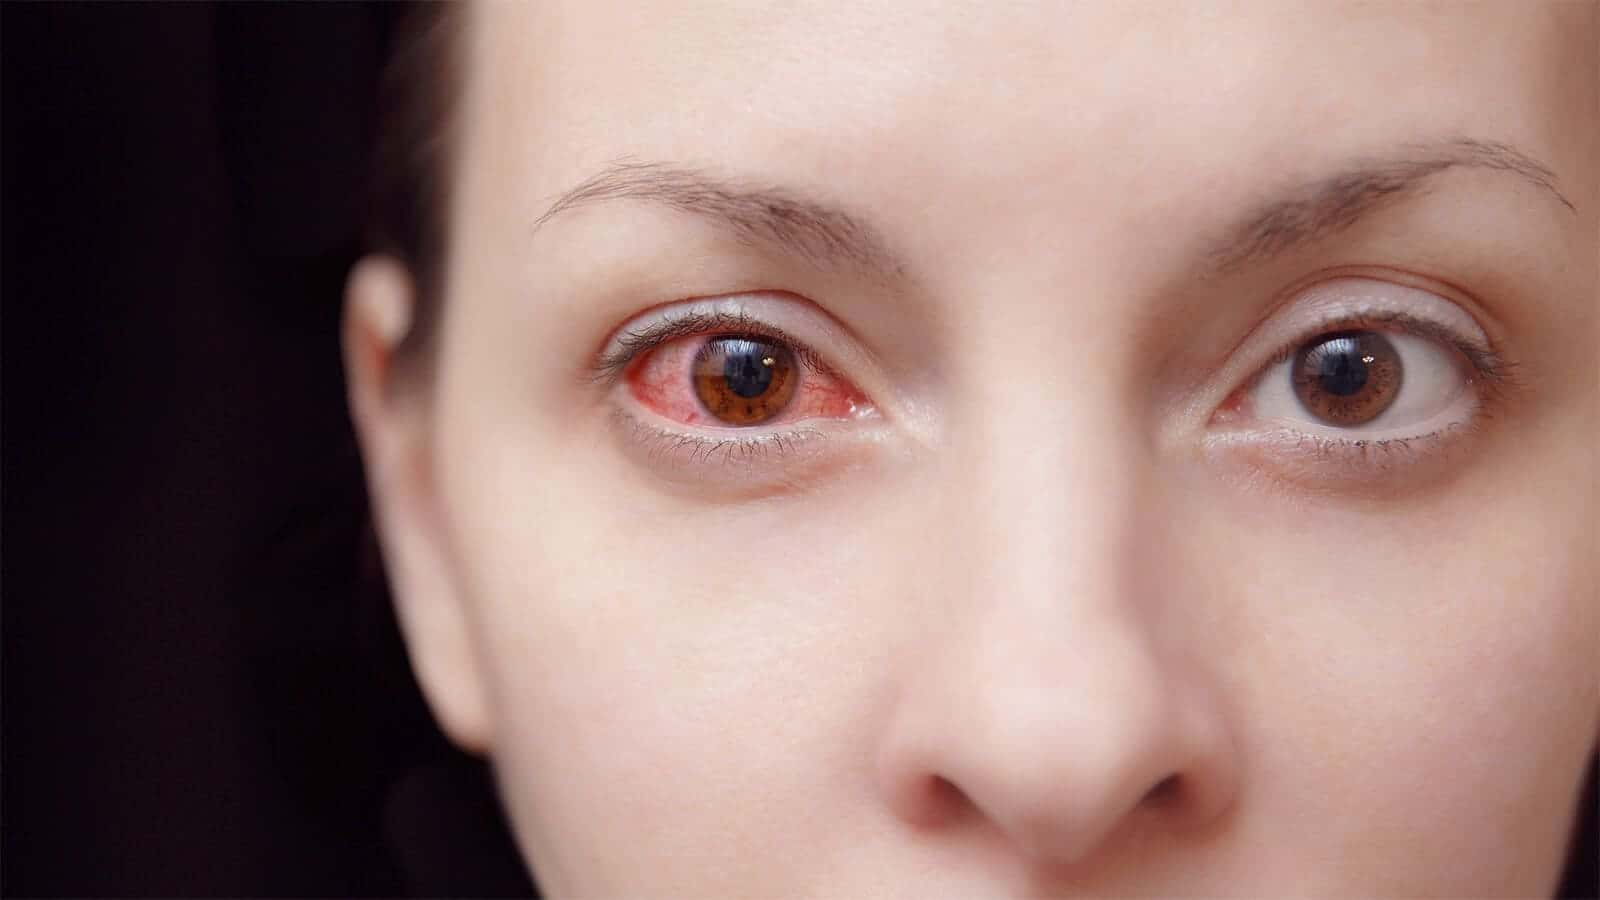 Conjunctivitis or Pink eyes